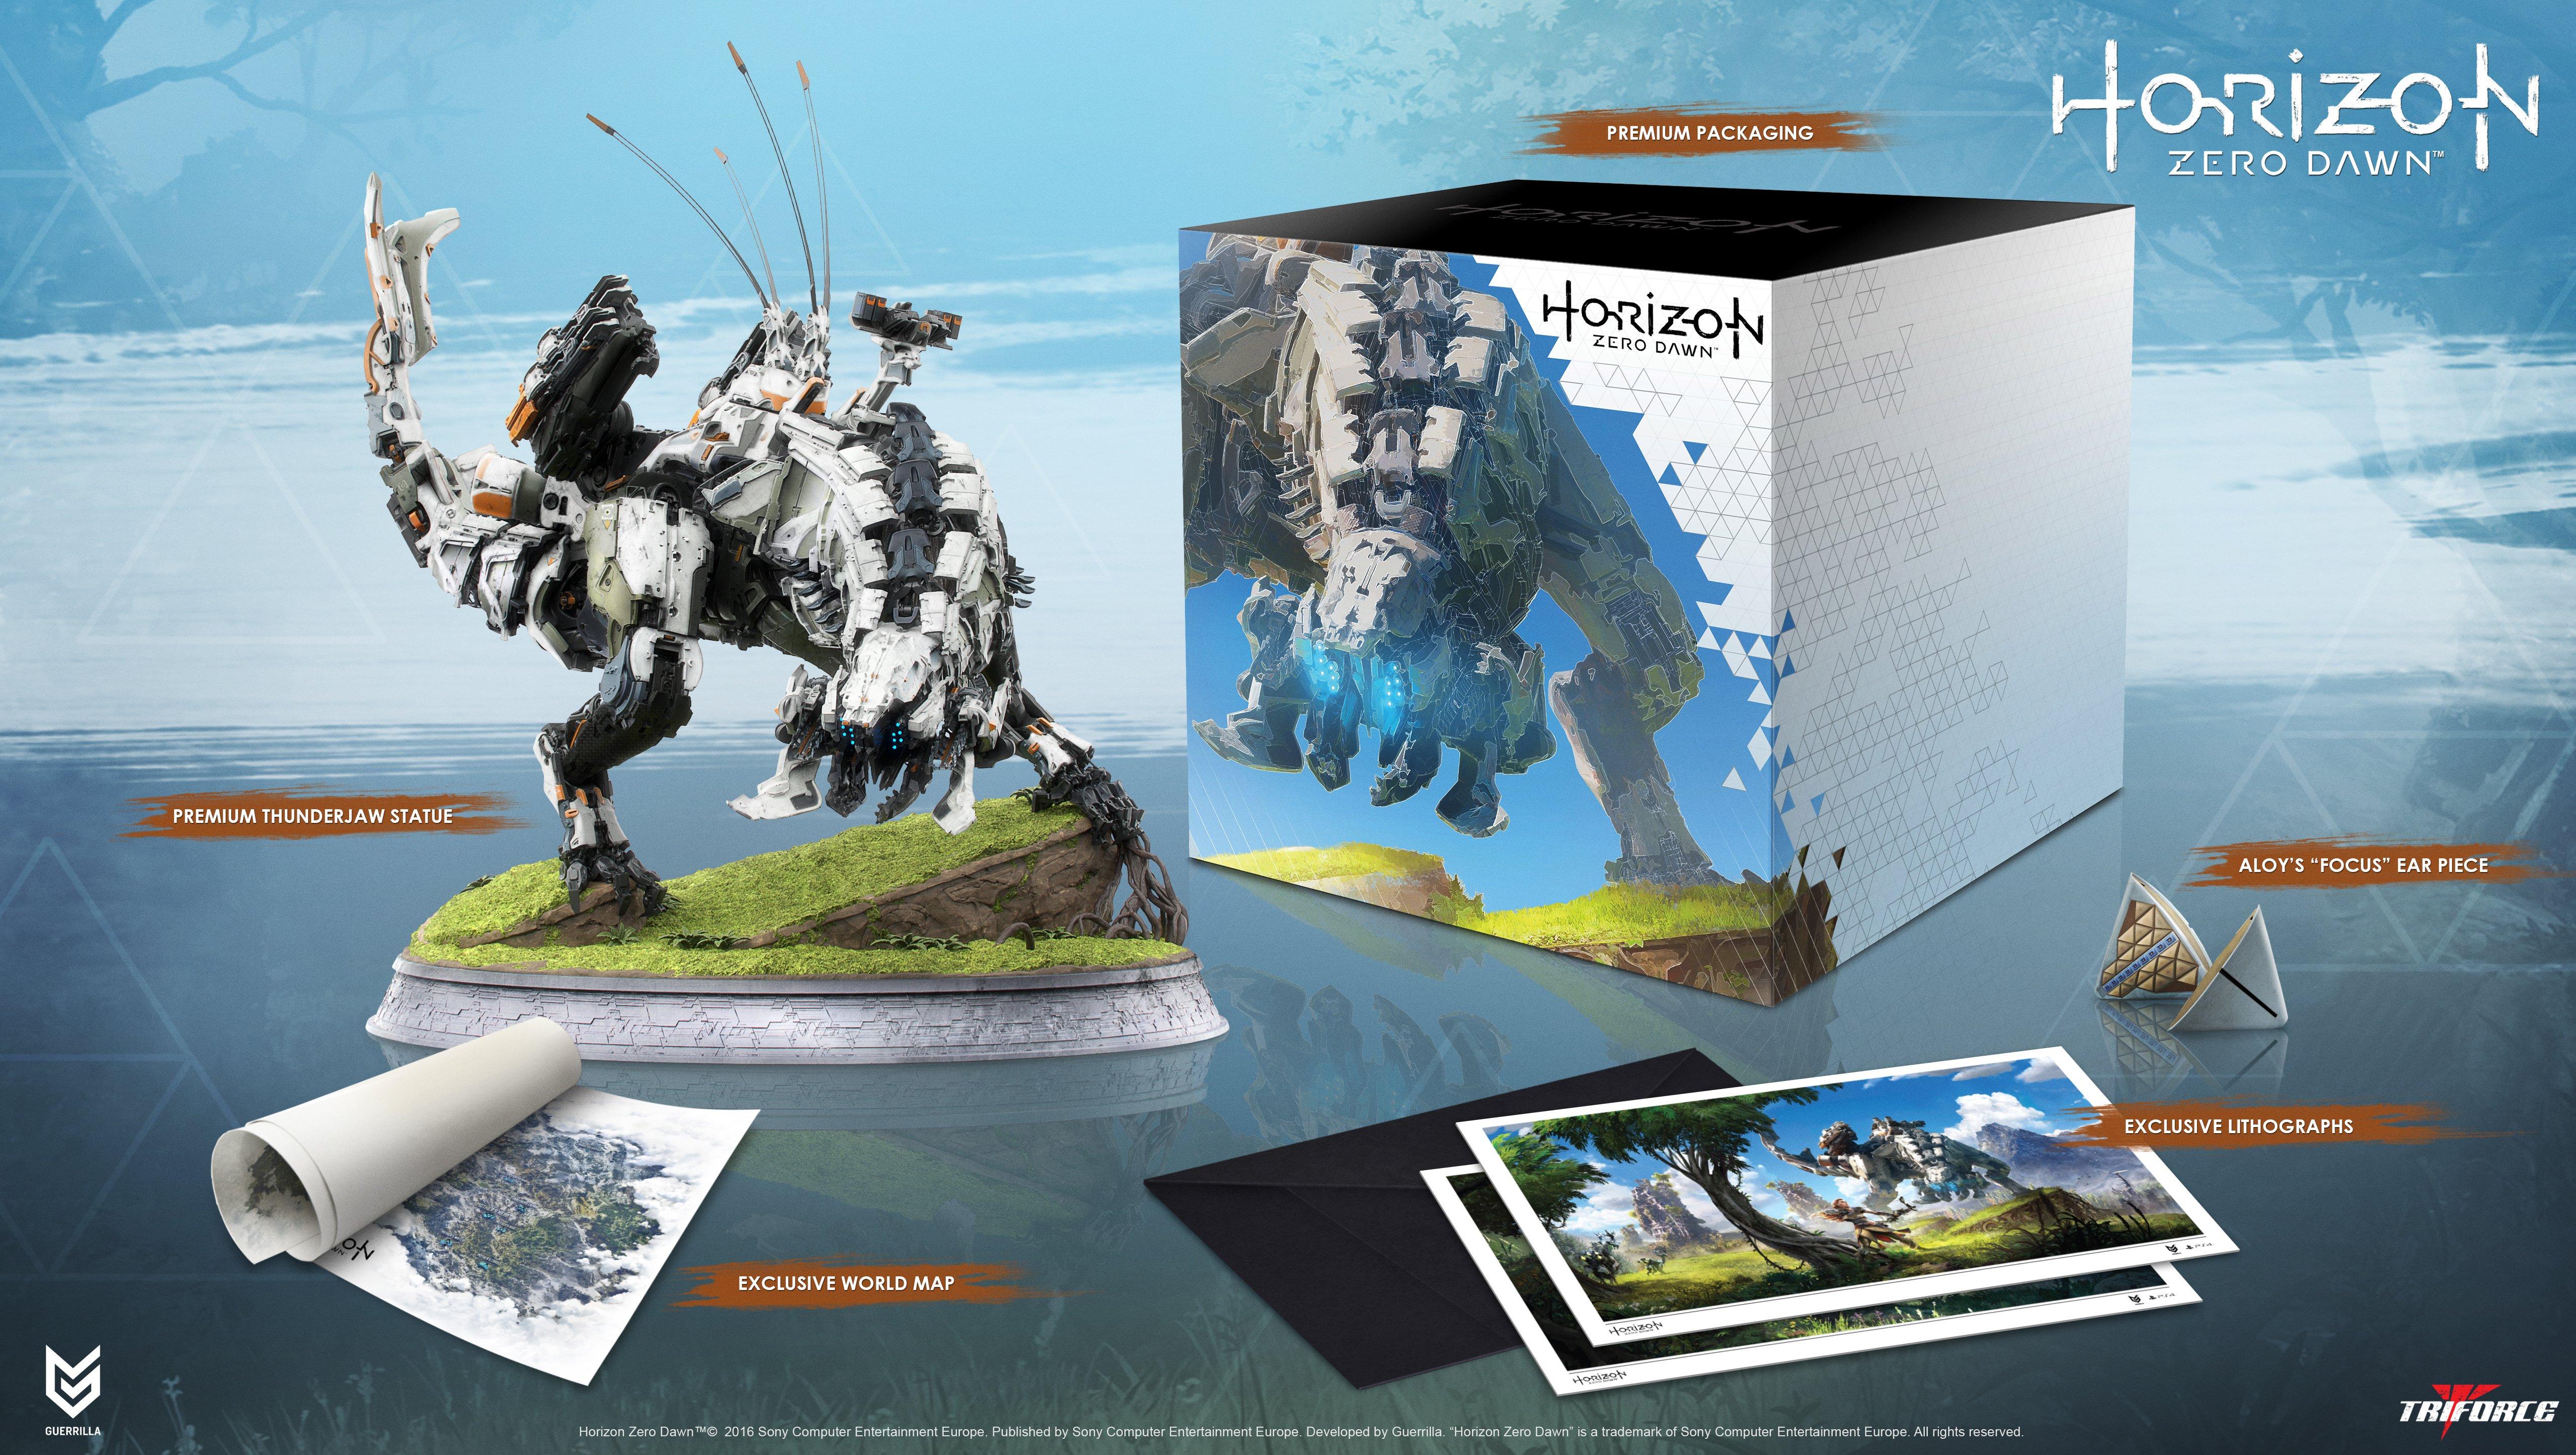 Horizon-ZeroDawn PS4 Div 027